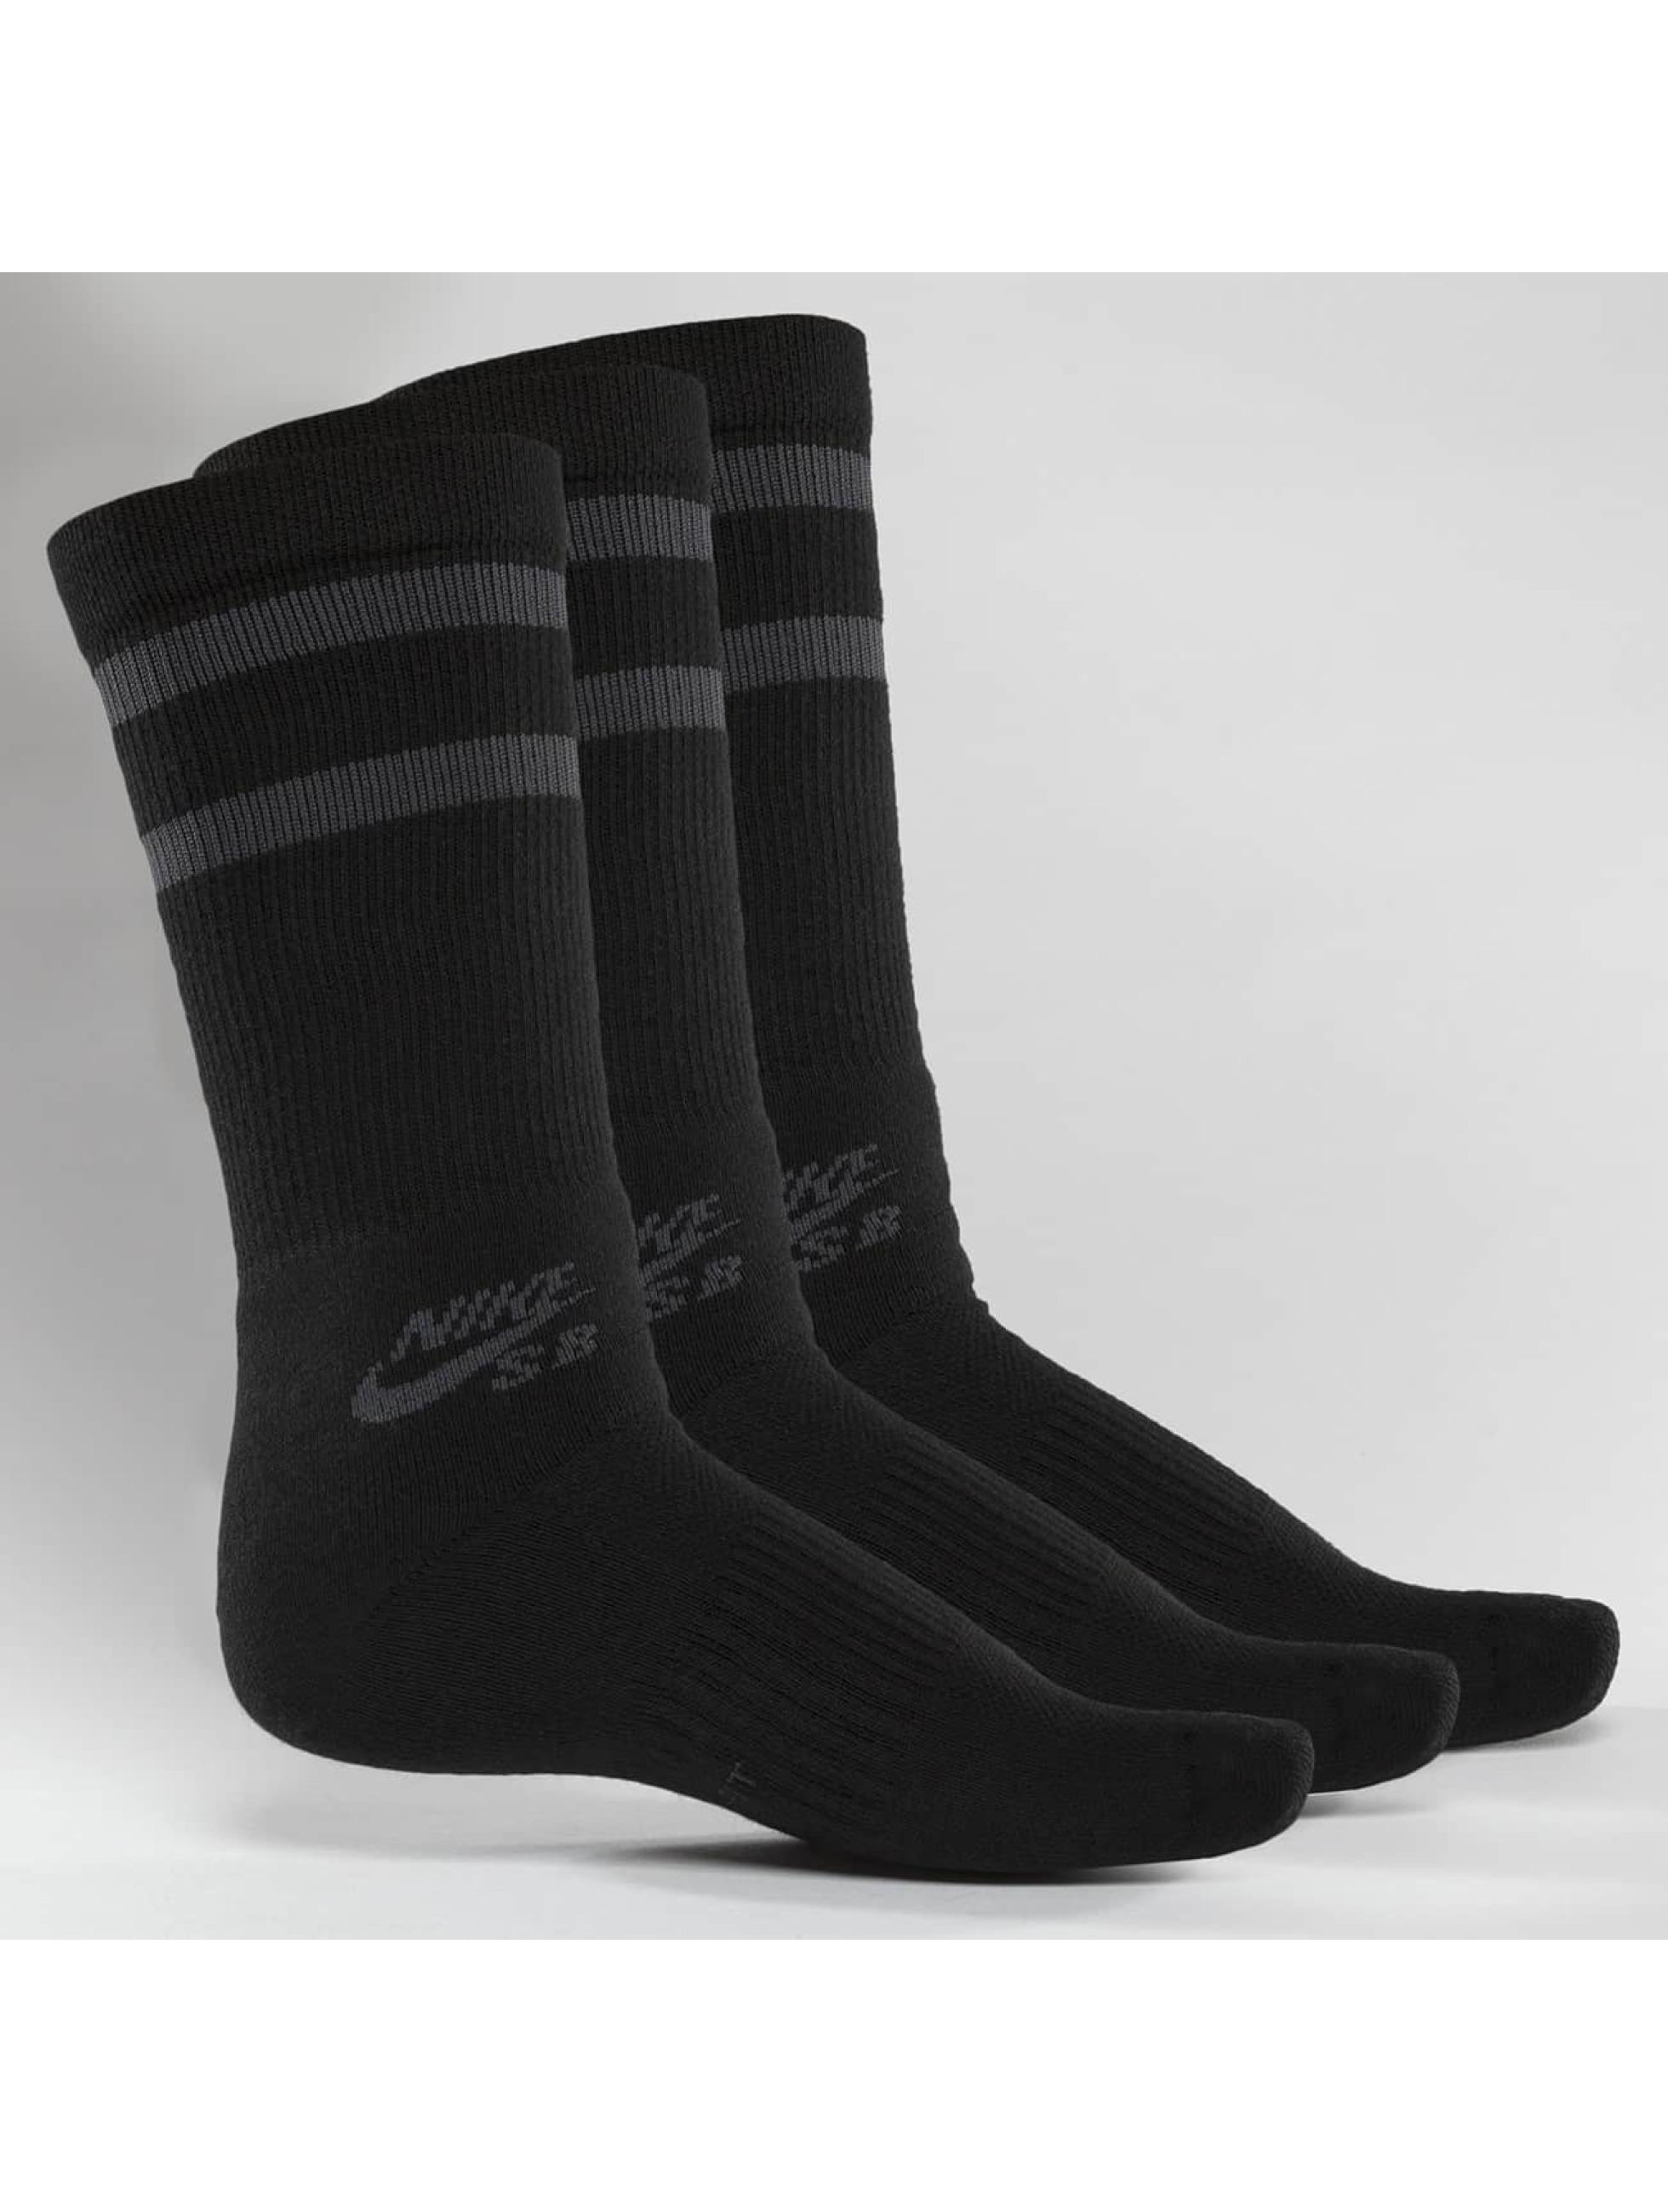 Nike SB Männer,Frauen Socken SB Crew Skateboarding 3-Pack in schwarz